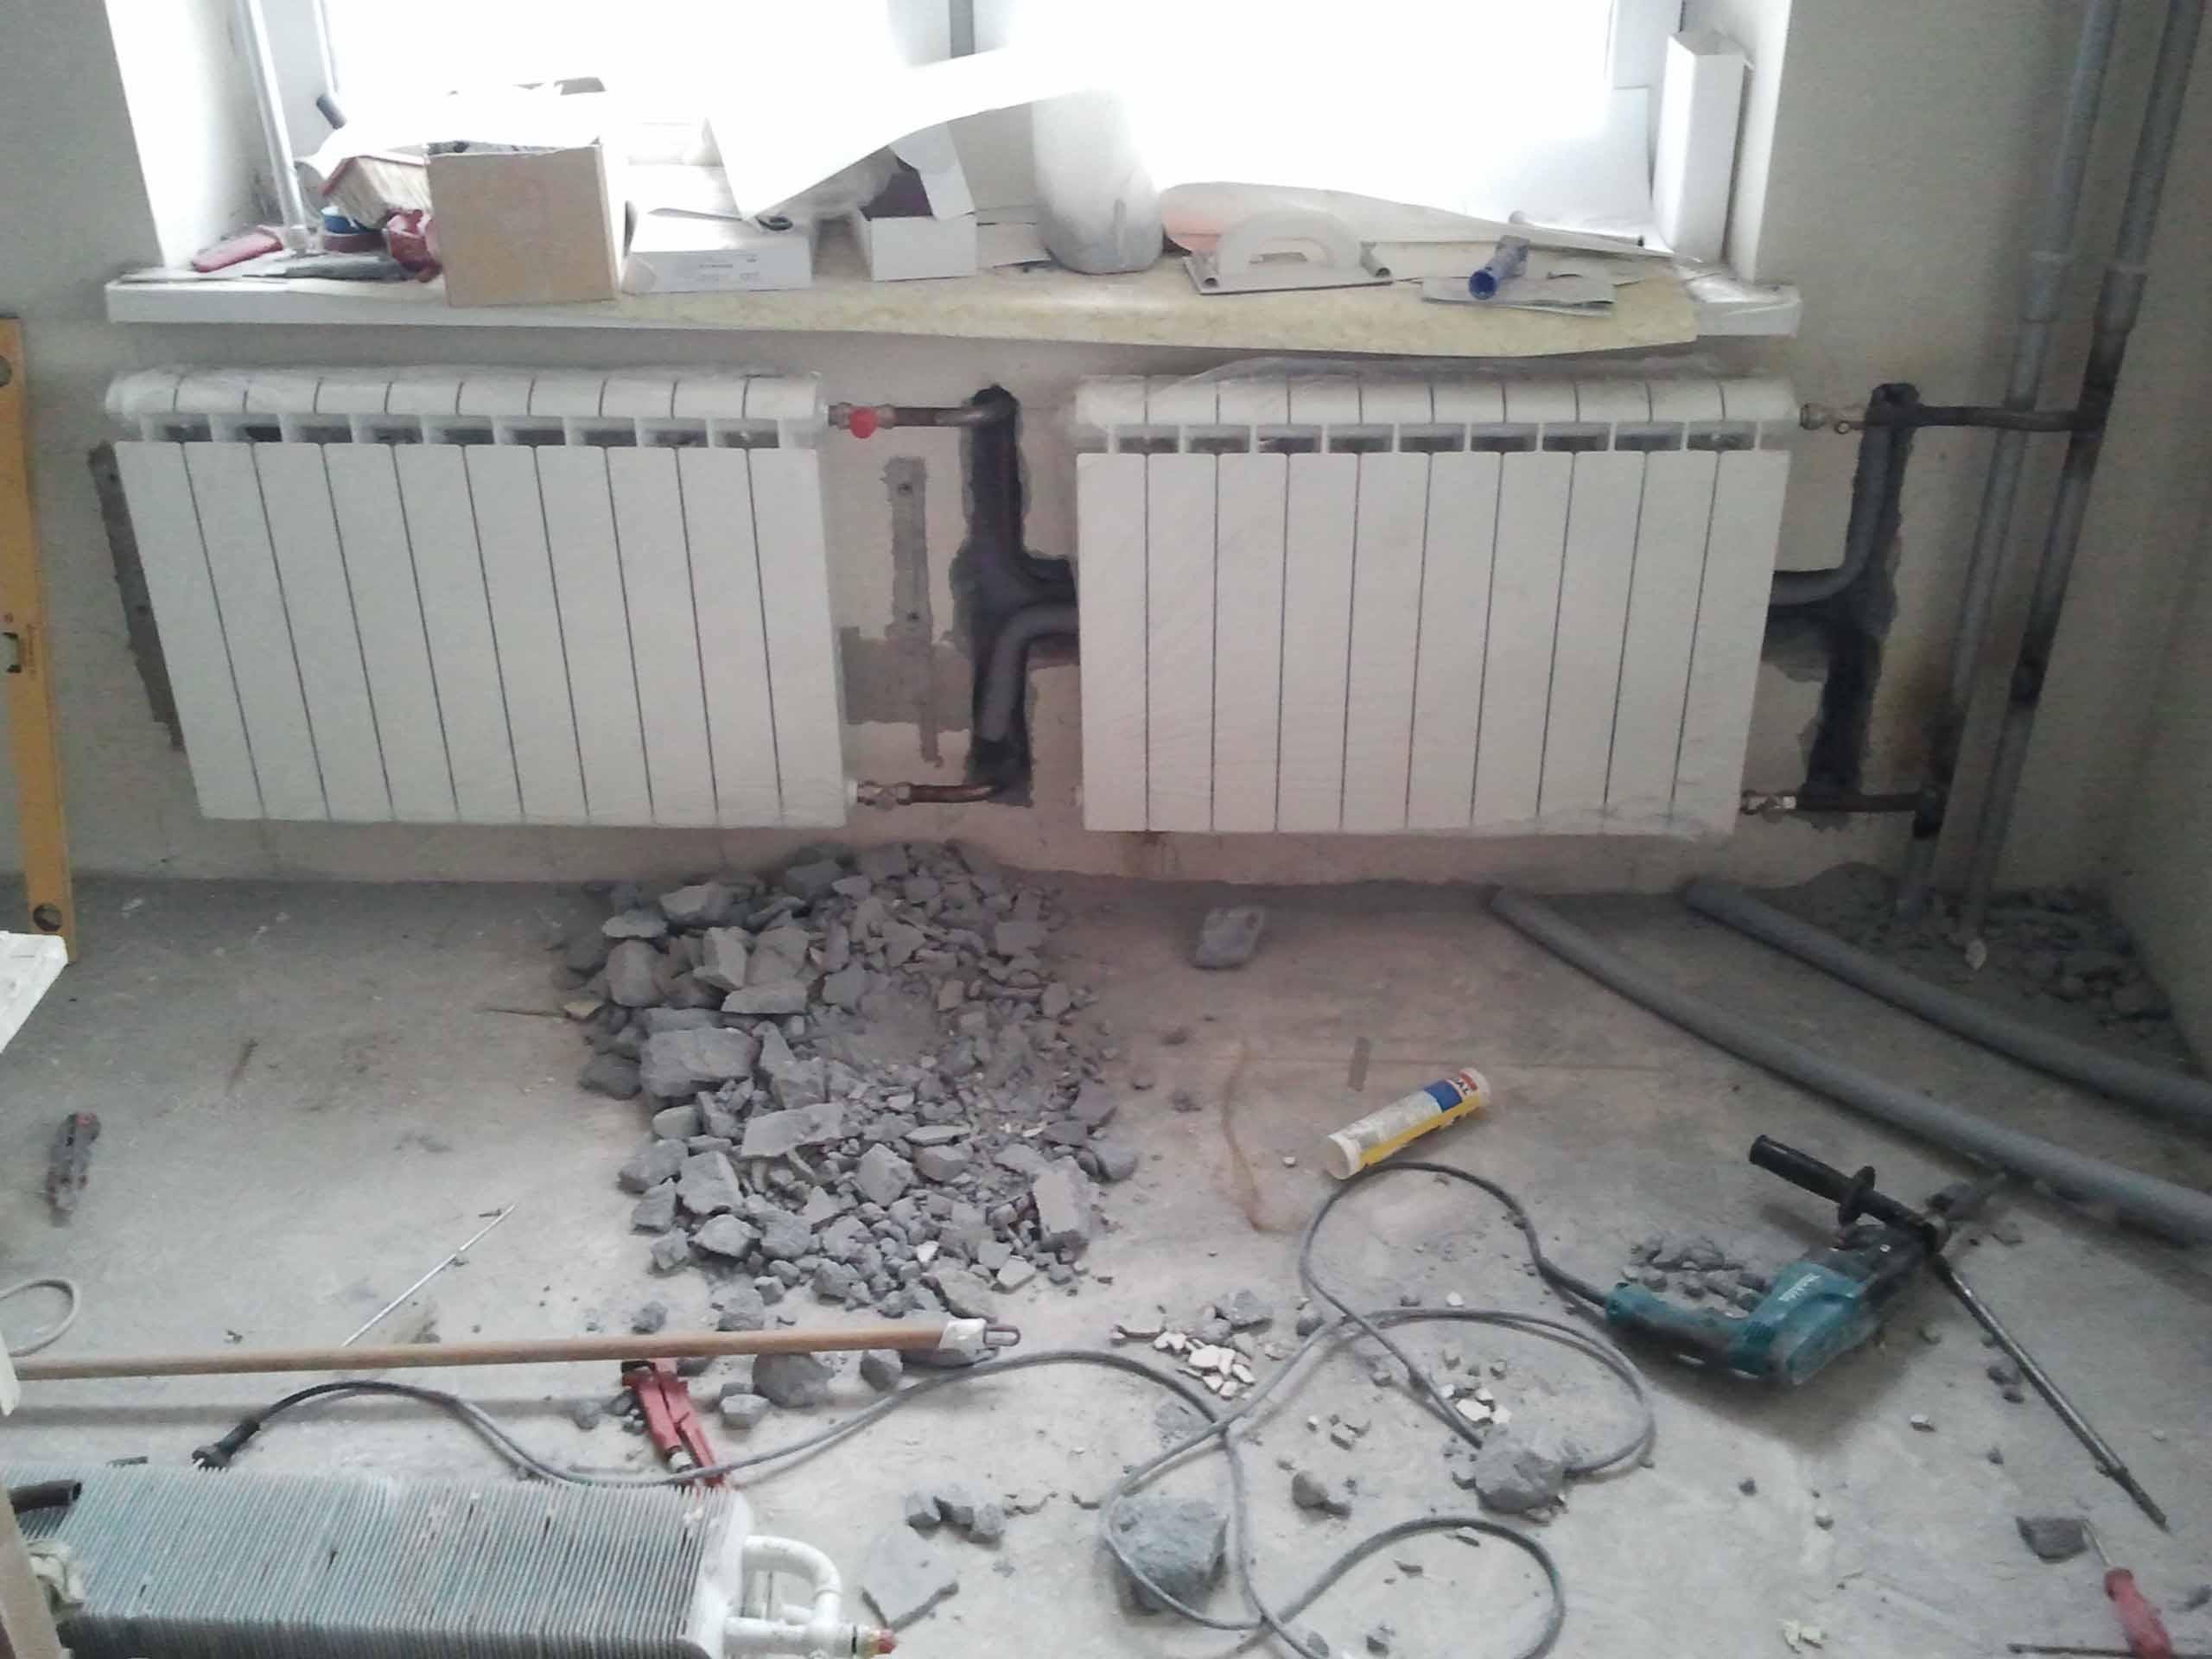 chauffage au gaz infrarouge travaux de chantier mulhouse nice lille soci t rglgj. Black Bedroom Furniture Sets. Home Design Ideas